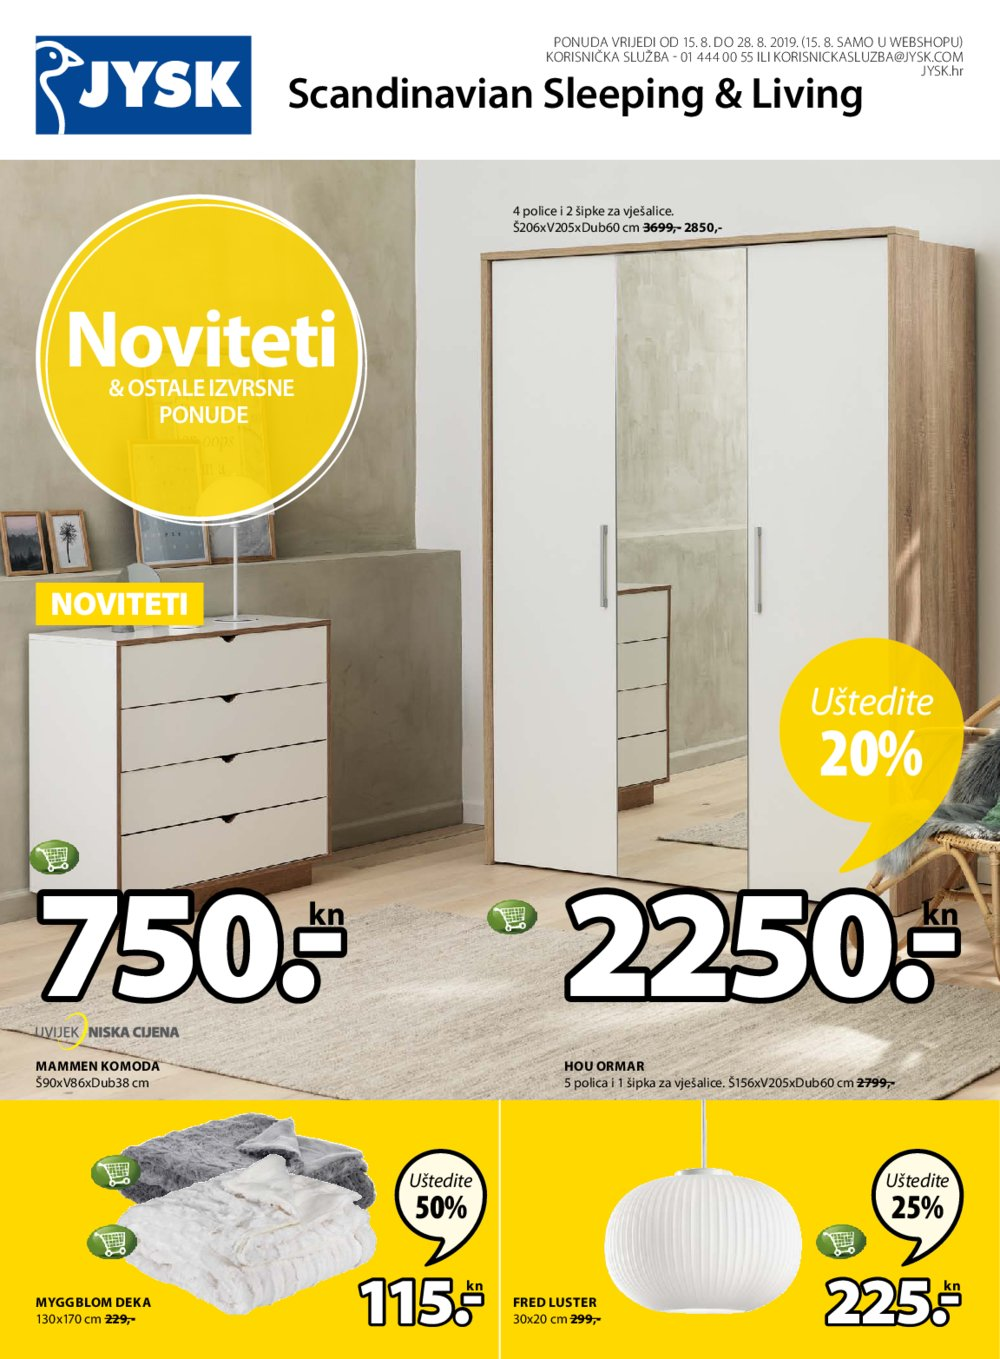 Jysk katalog Akcija 15.08.2019.-28.08.2019.